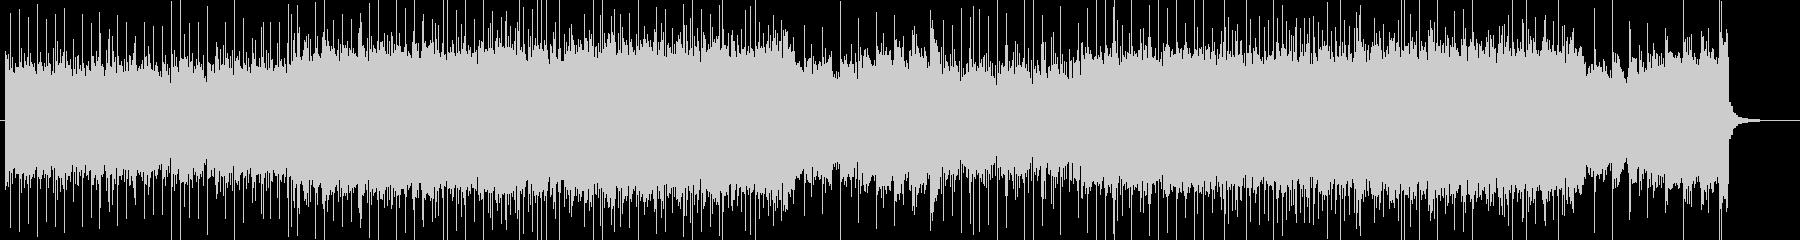 「HR/HM」「ROCK」BGM153の未再生の波形